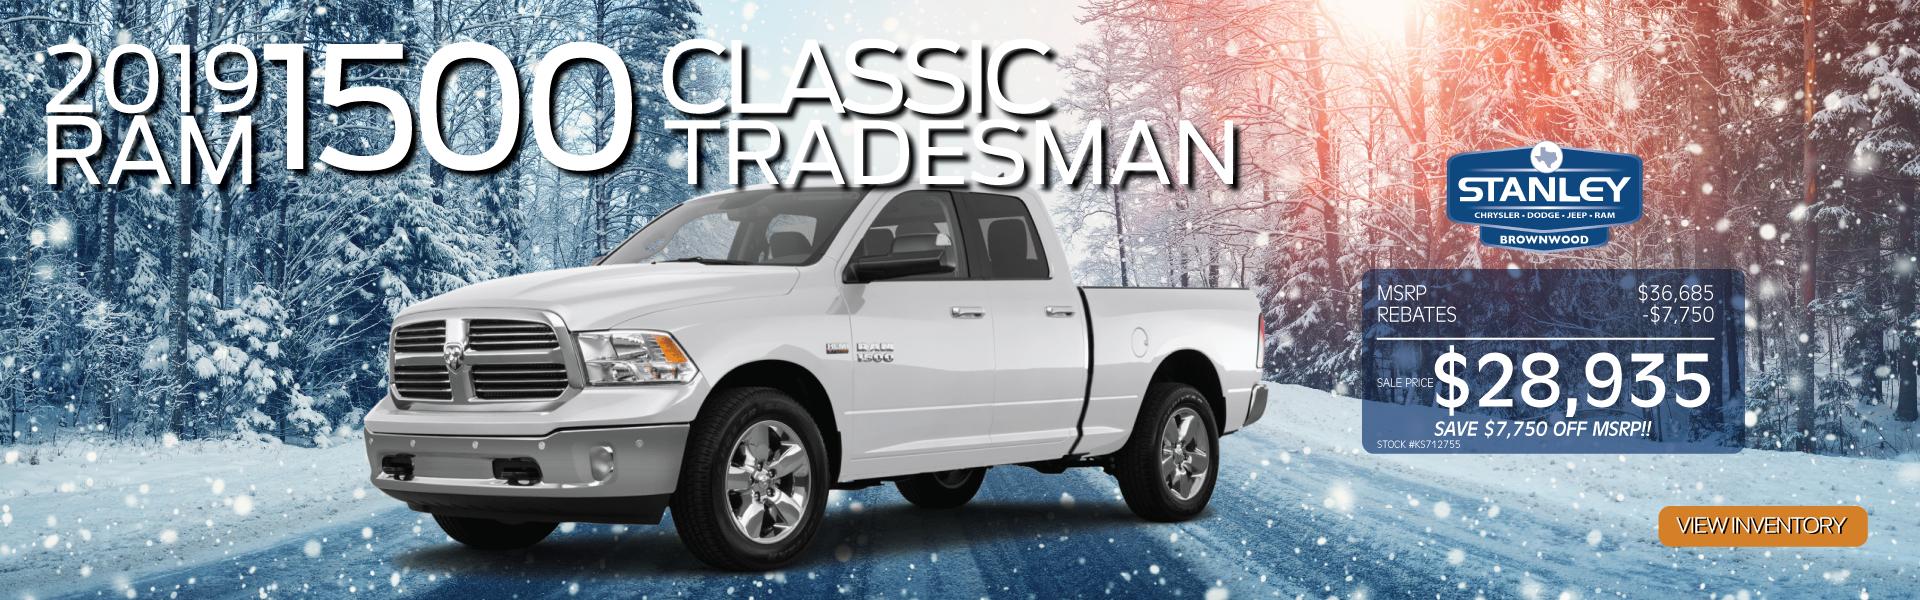 Ram 1500 Classic Tradesman